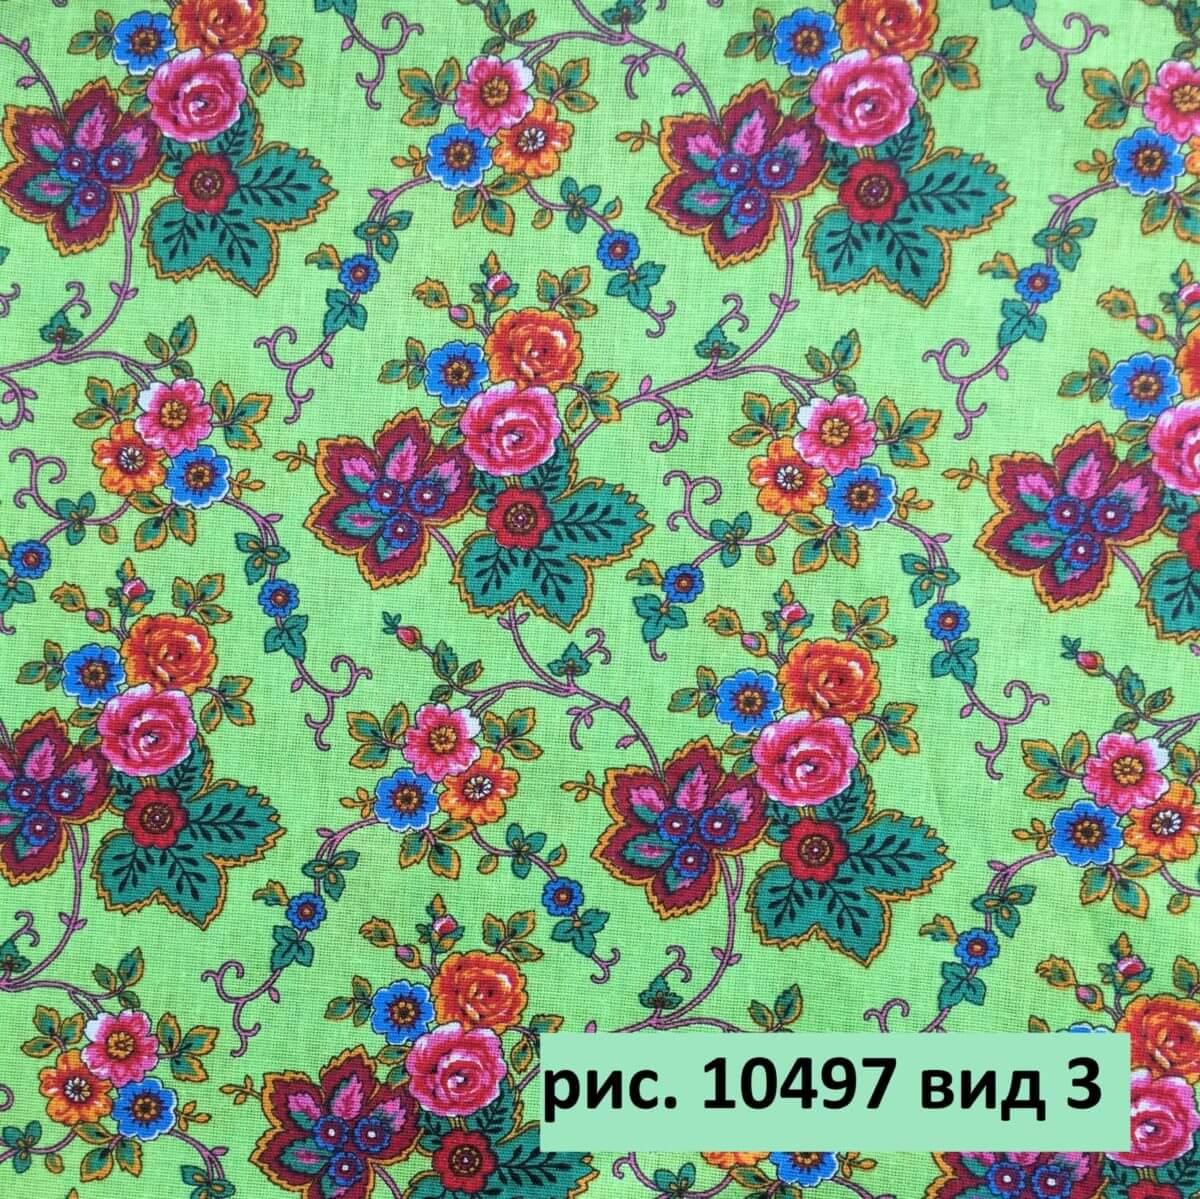 Фото 12 - Плательная ткань бязь 150 см (10497/3) Под заказ.